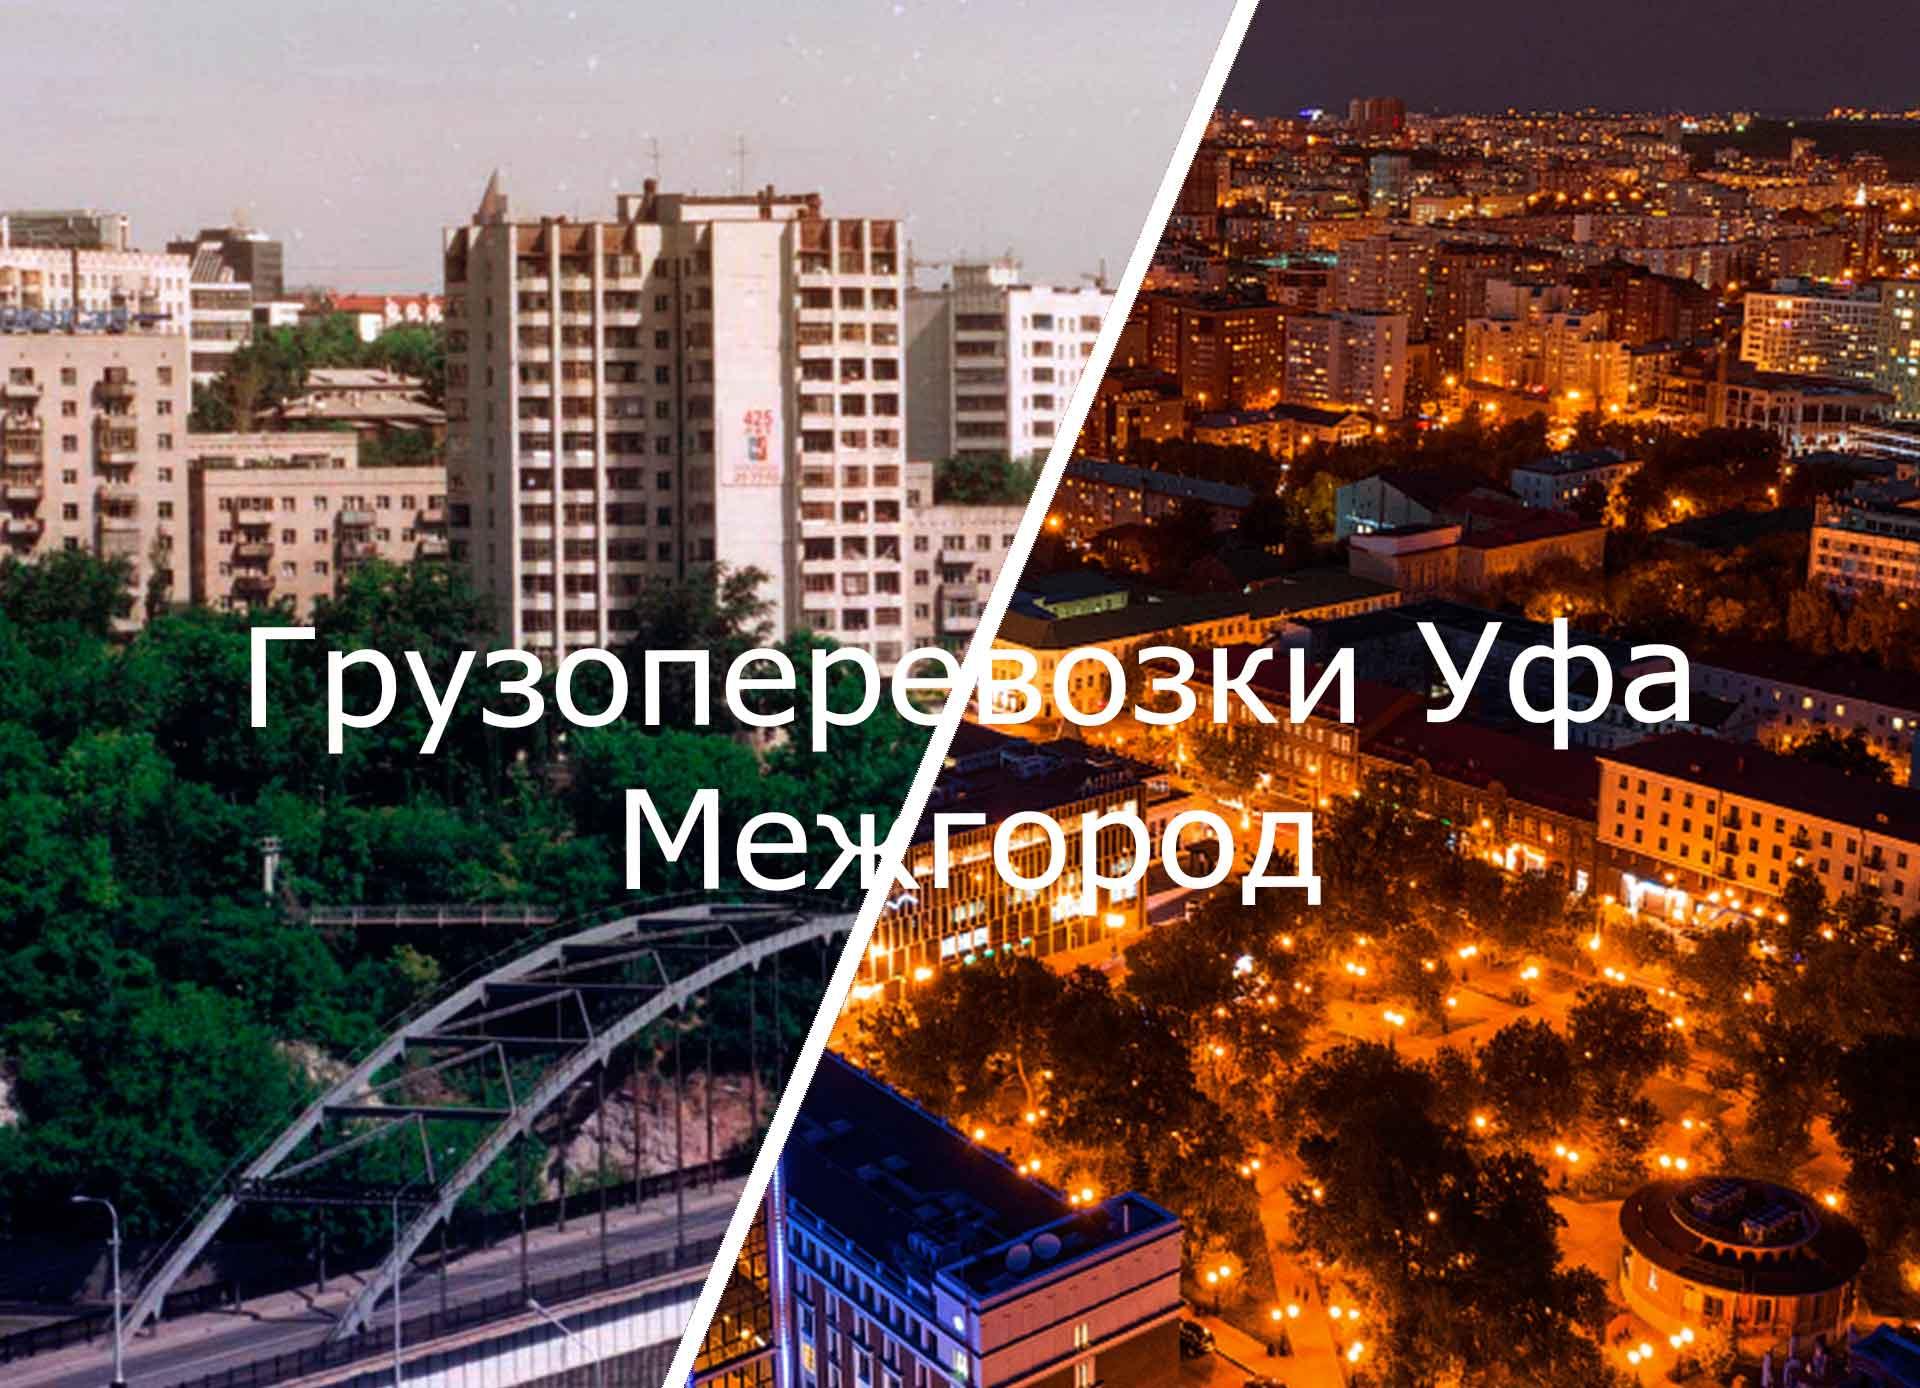 грузоперевозки уфа межгород